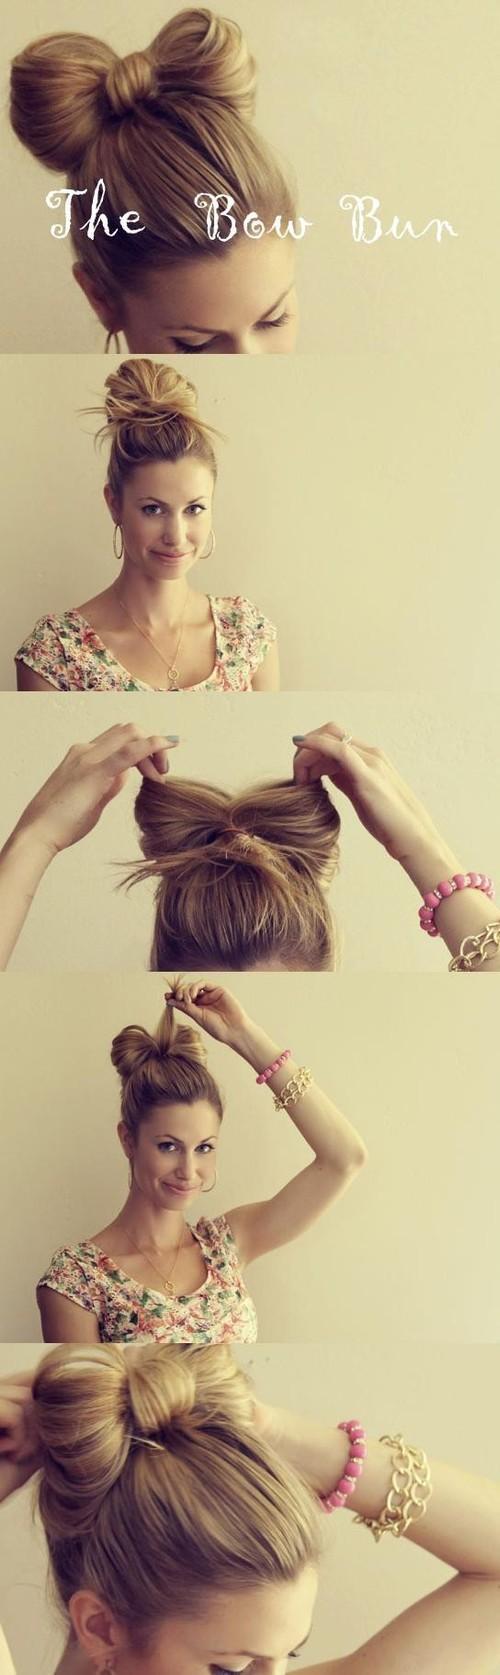 hair and makeup / Bow bun... Cute!